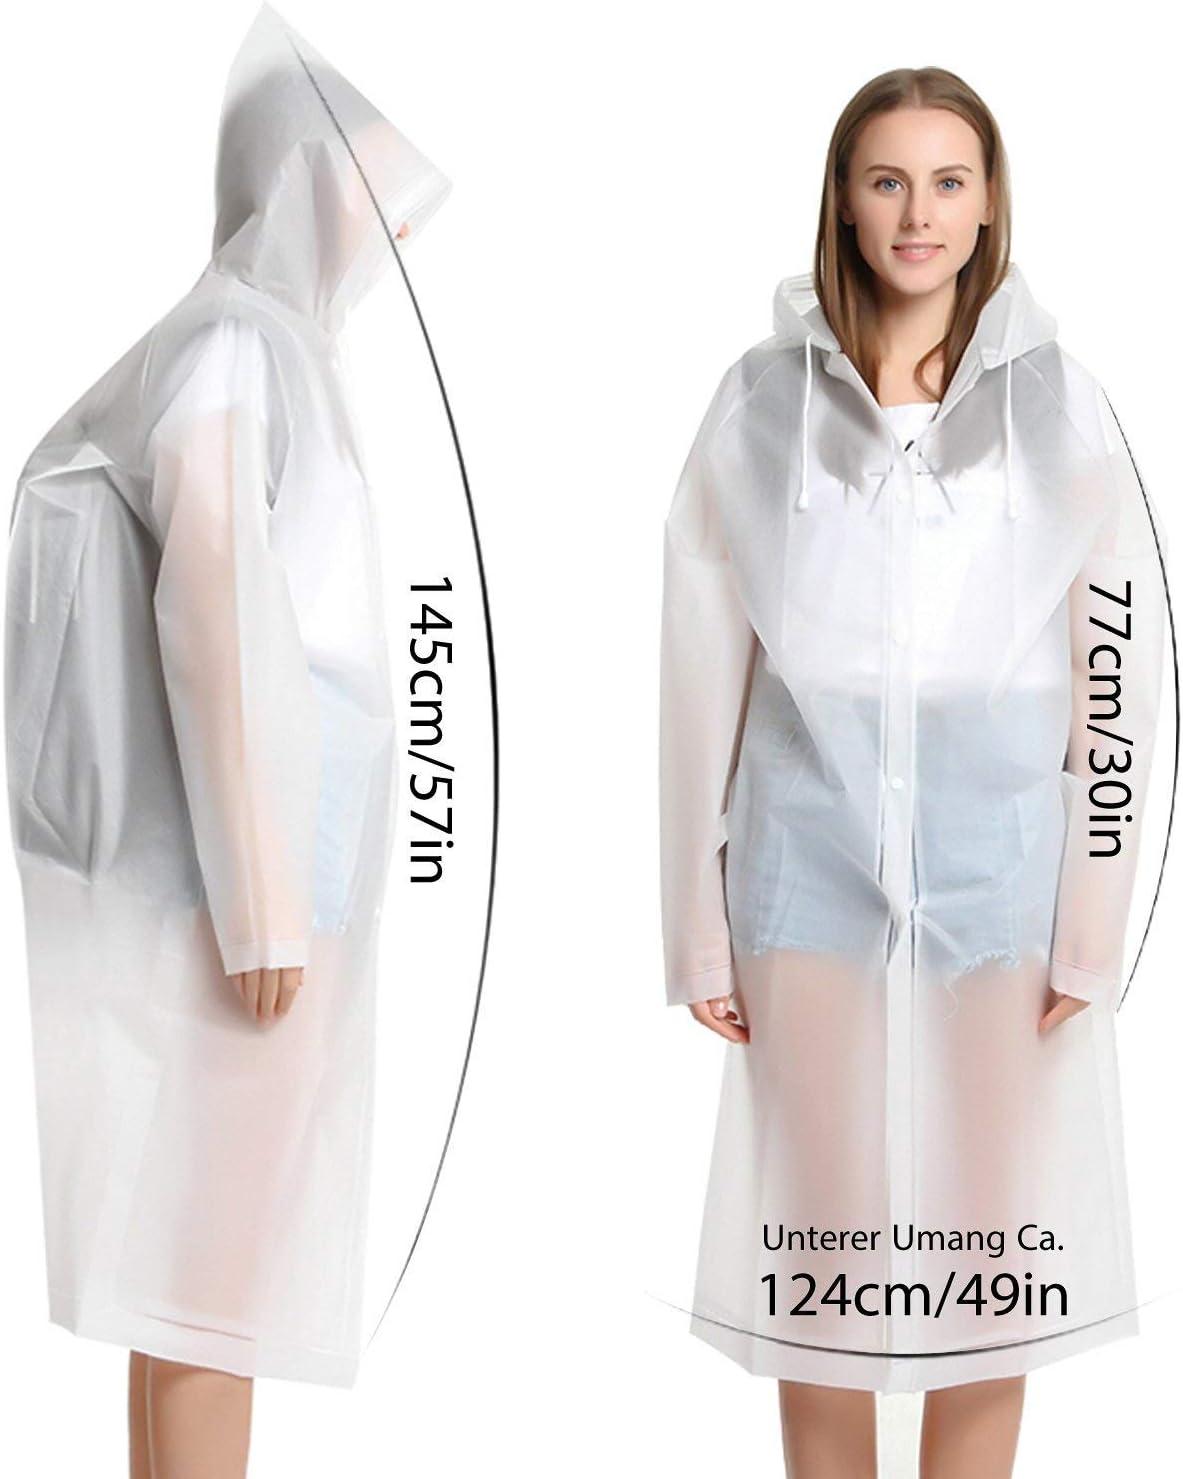 190 cm Eva Pack of 2 LEO Transparent Rain Poncho Reusable Raincoat Waterproof Breathable Rain Cape Portable Rain Coat Rain Jacket Hiking Camping Fishing 160